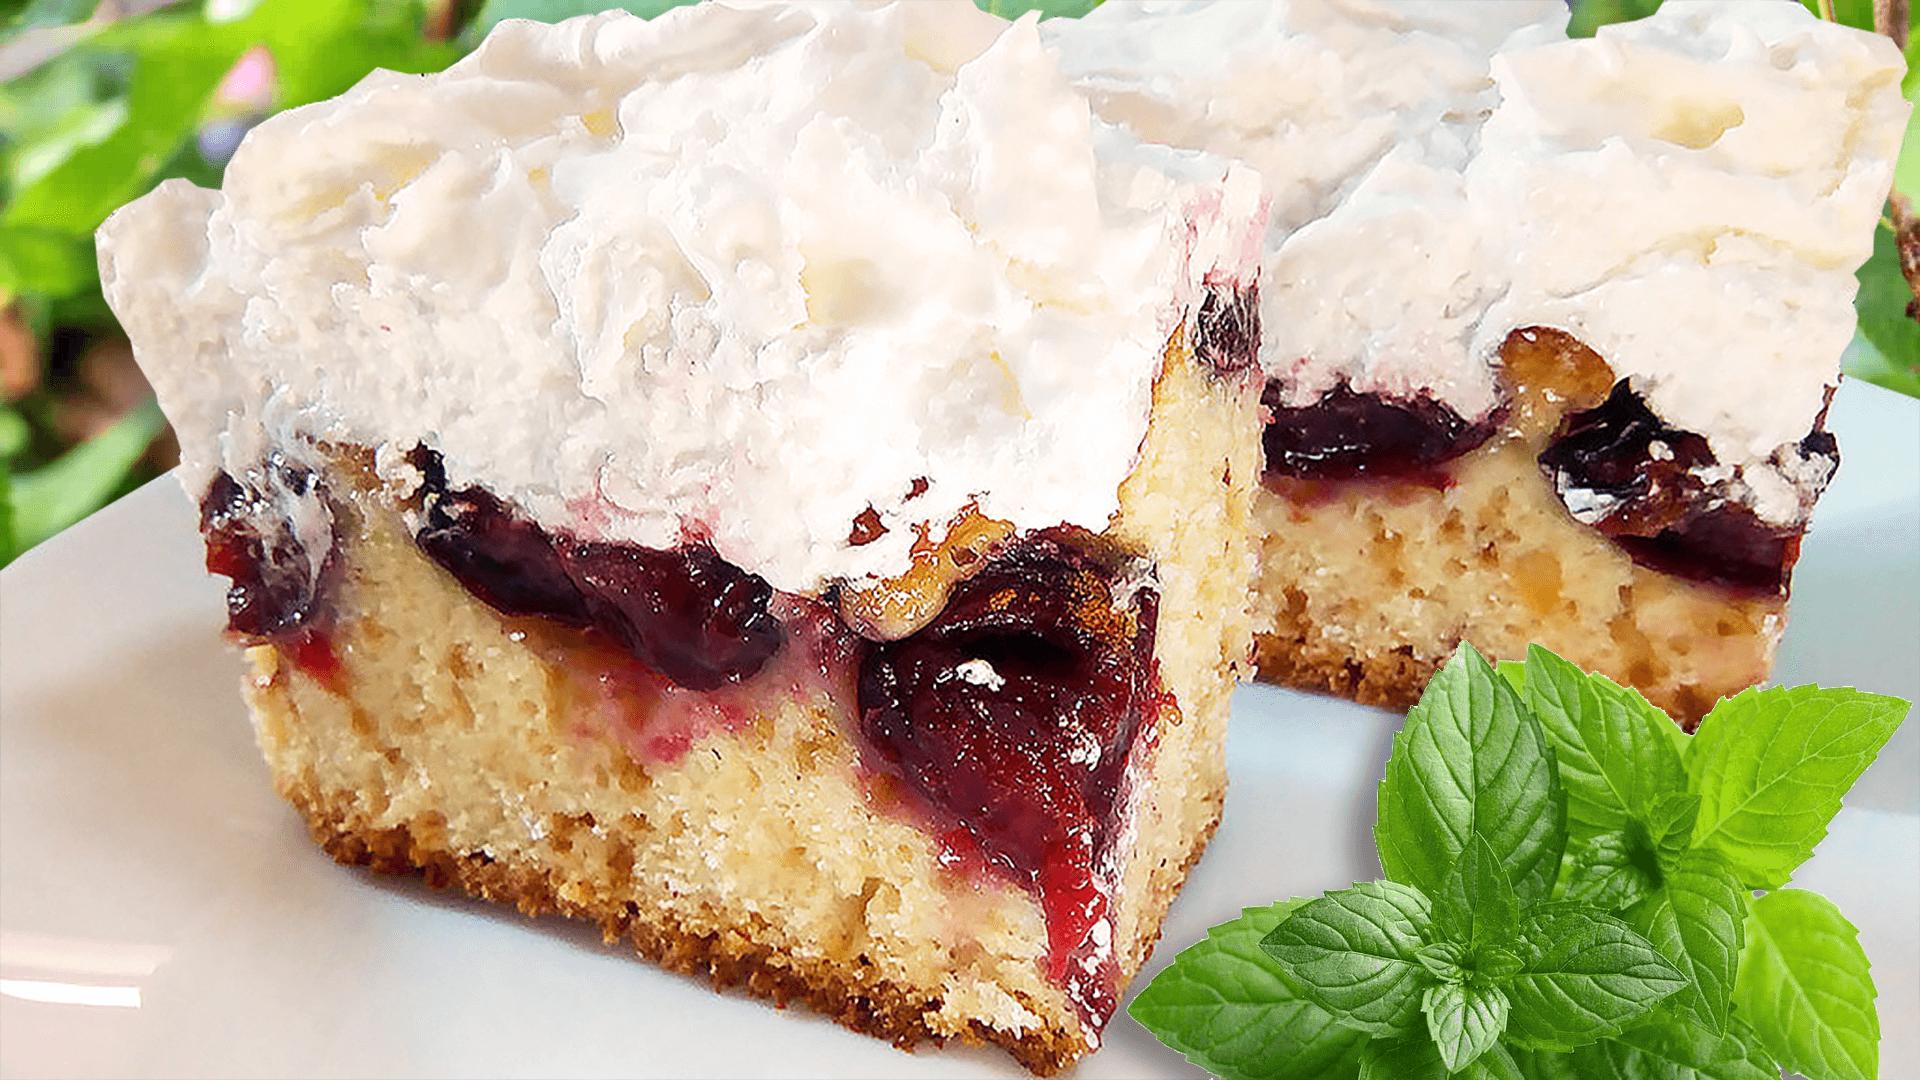 Homemade Plum Cake with Meringue